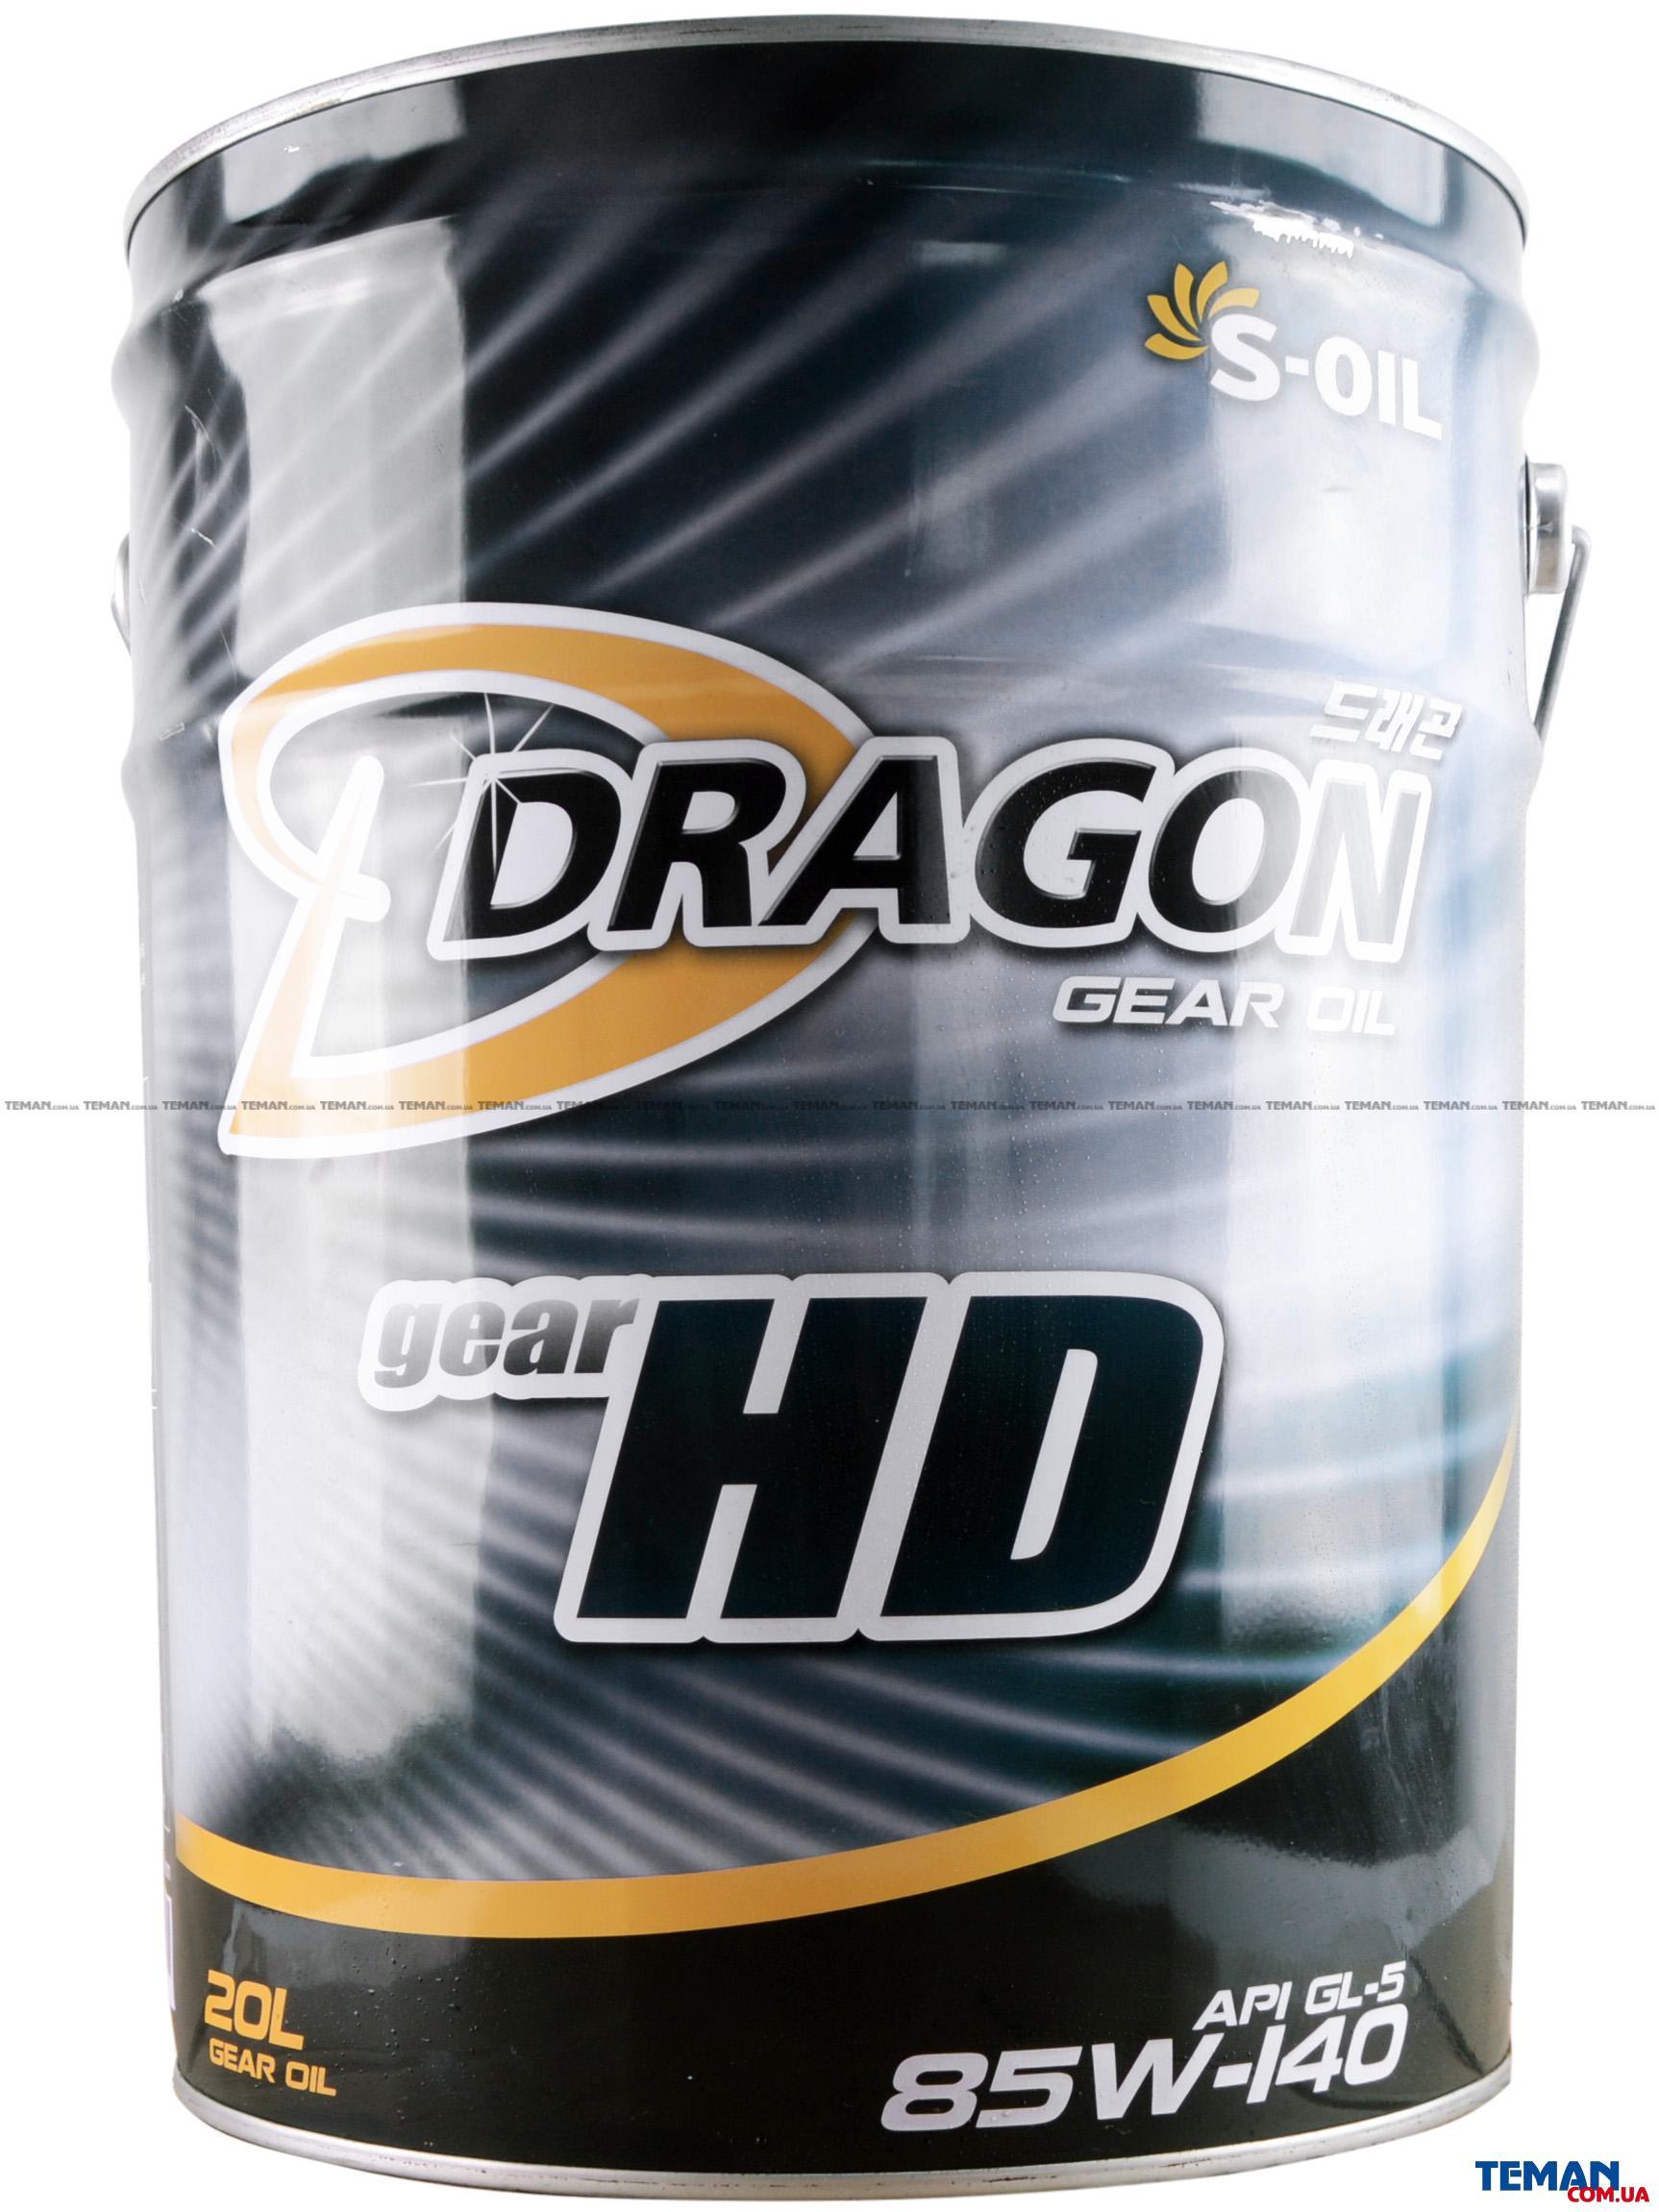 Трансмиссионное масло DRAGON GEAR HD 85W140, 20 л